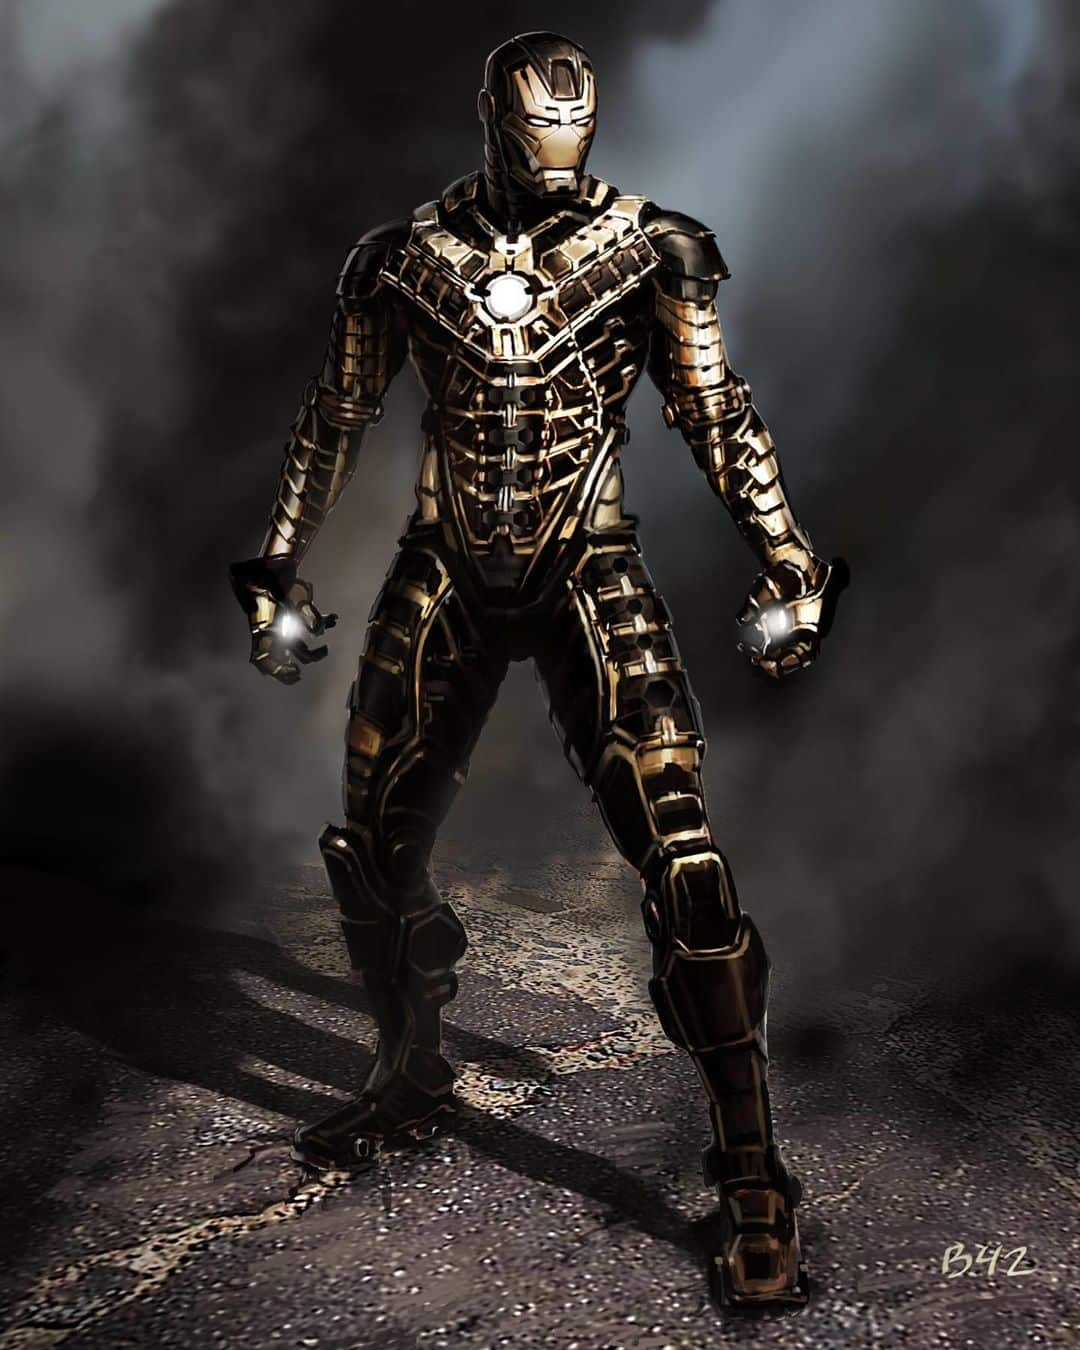 ryan meinerding art Iron man 2